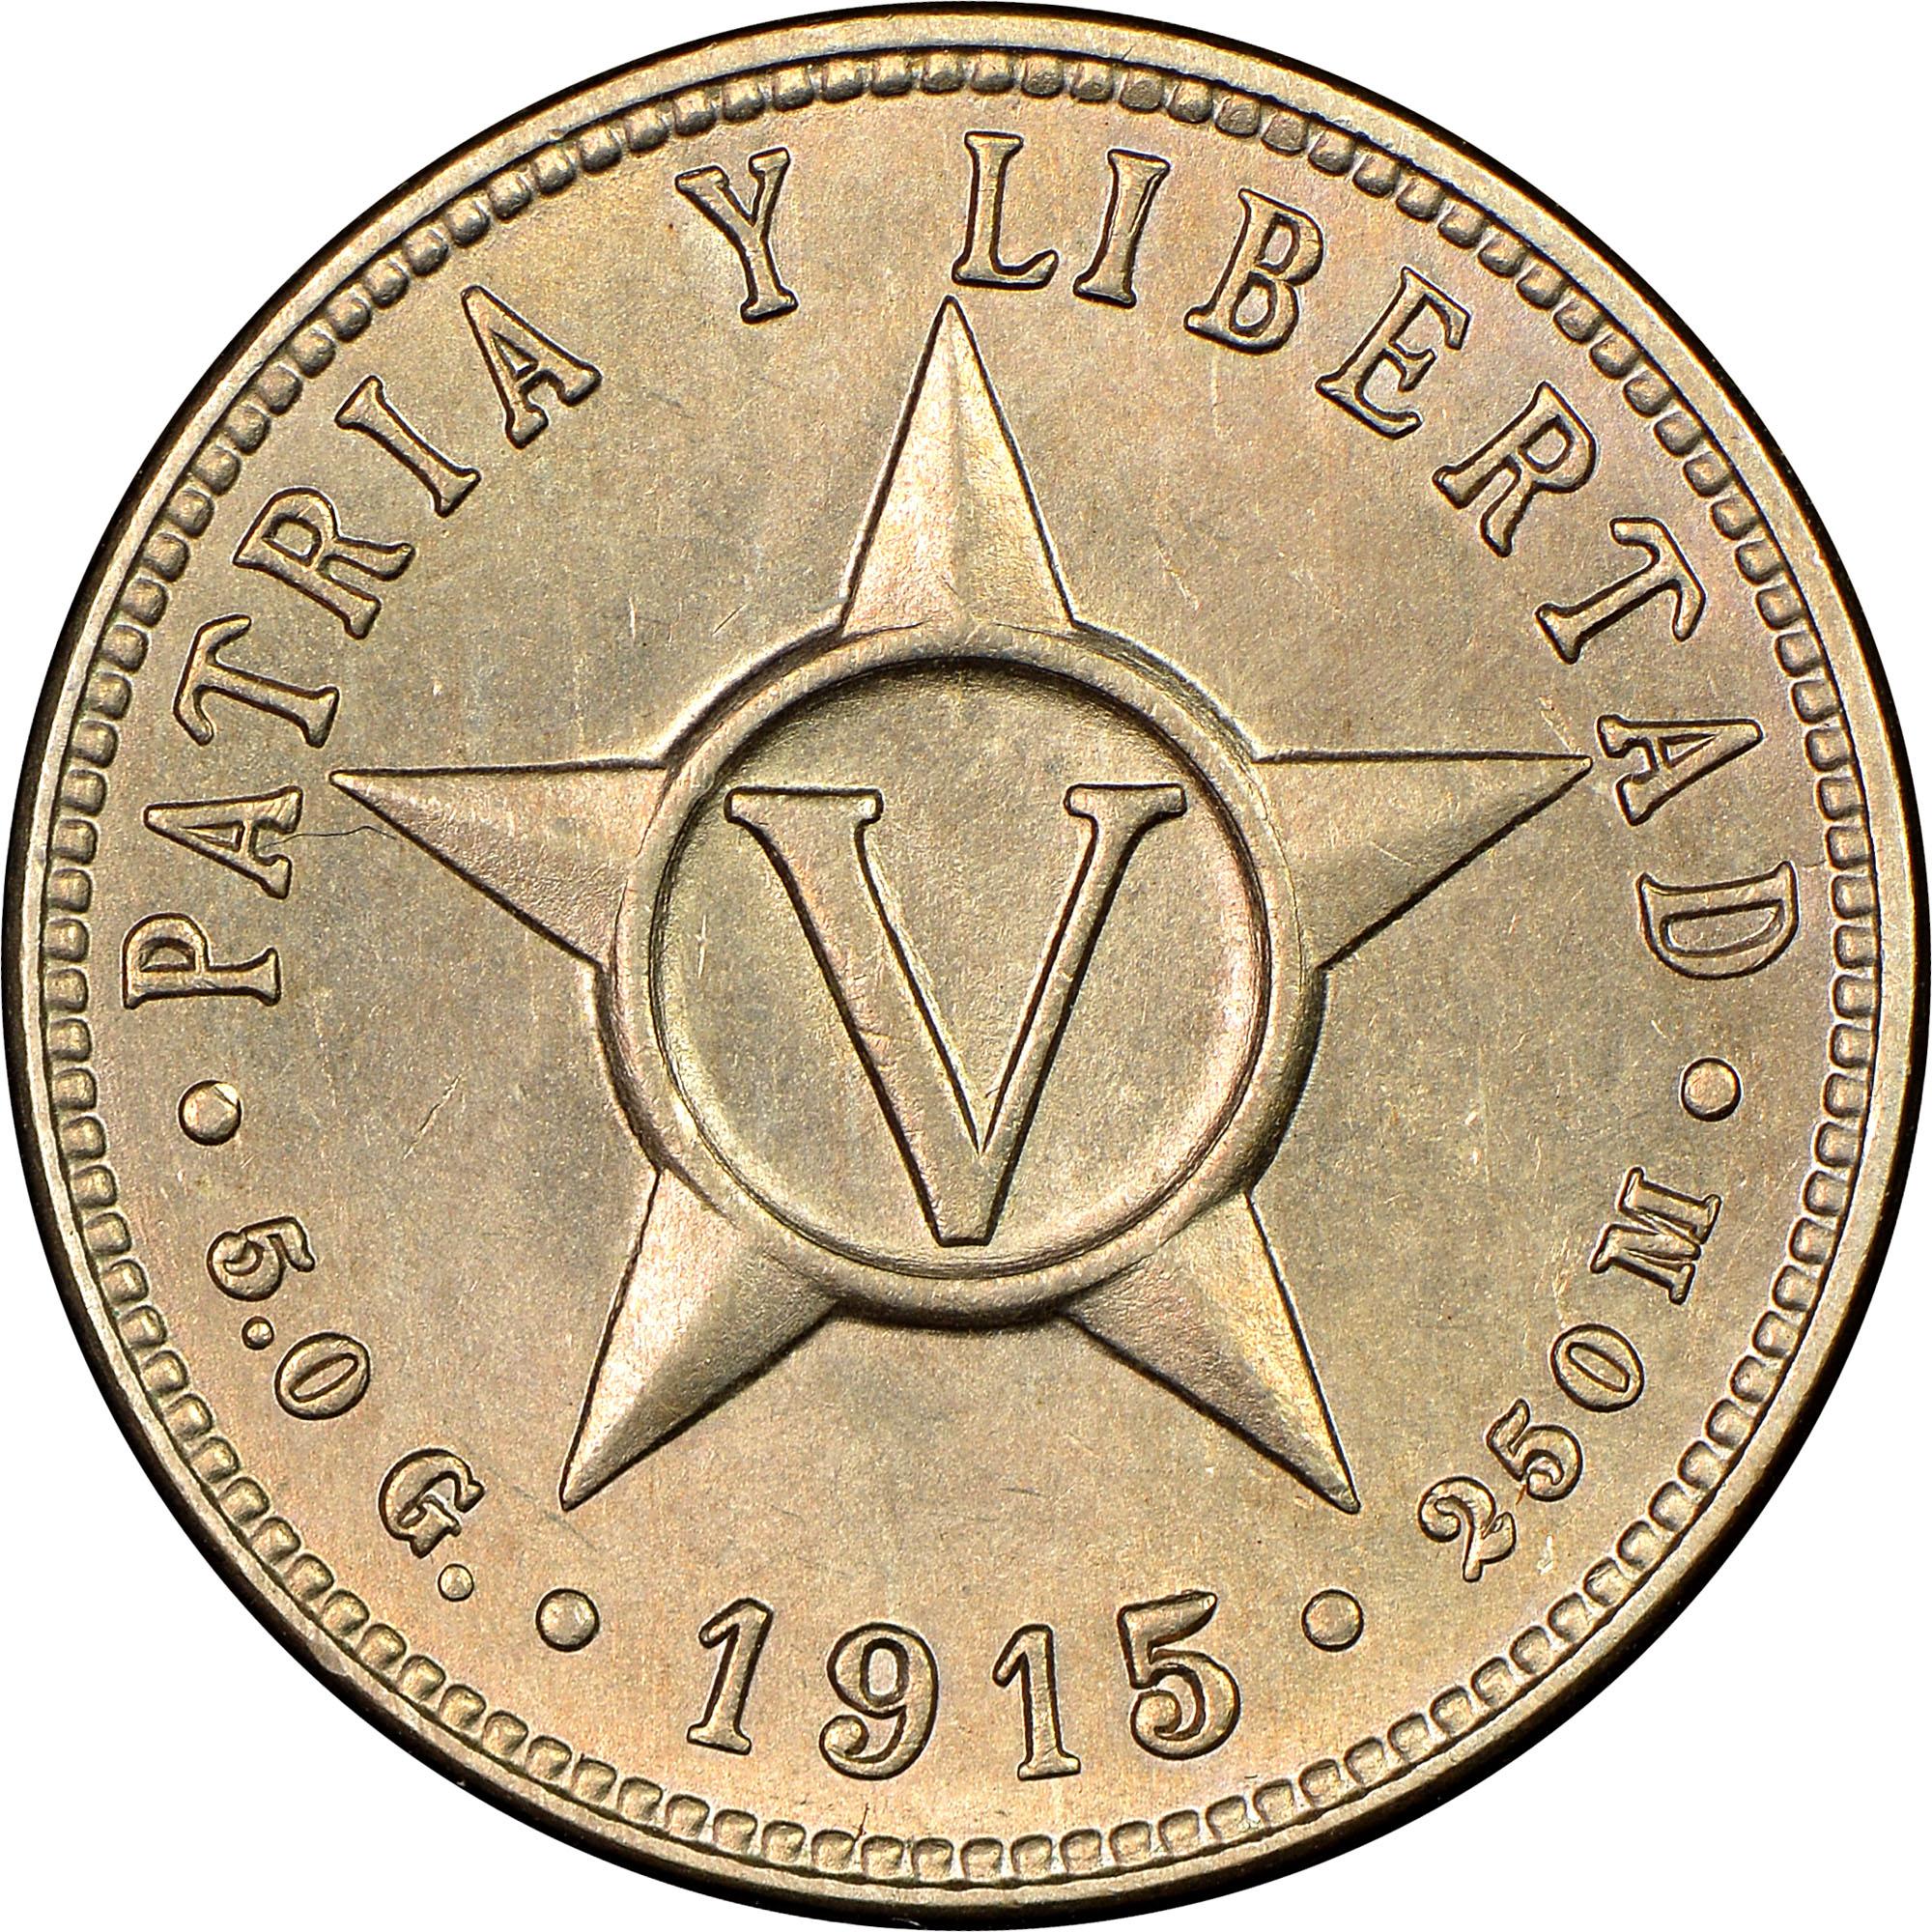 1915-1920 Cuba 5 Centavos reverse